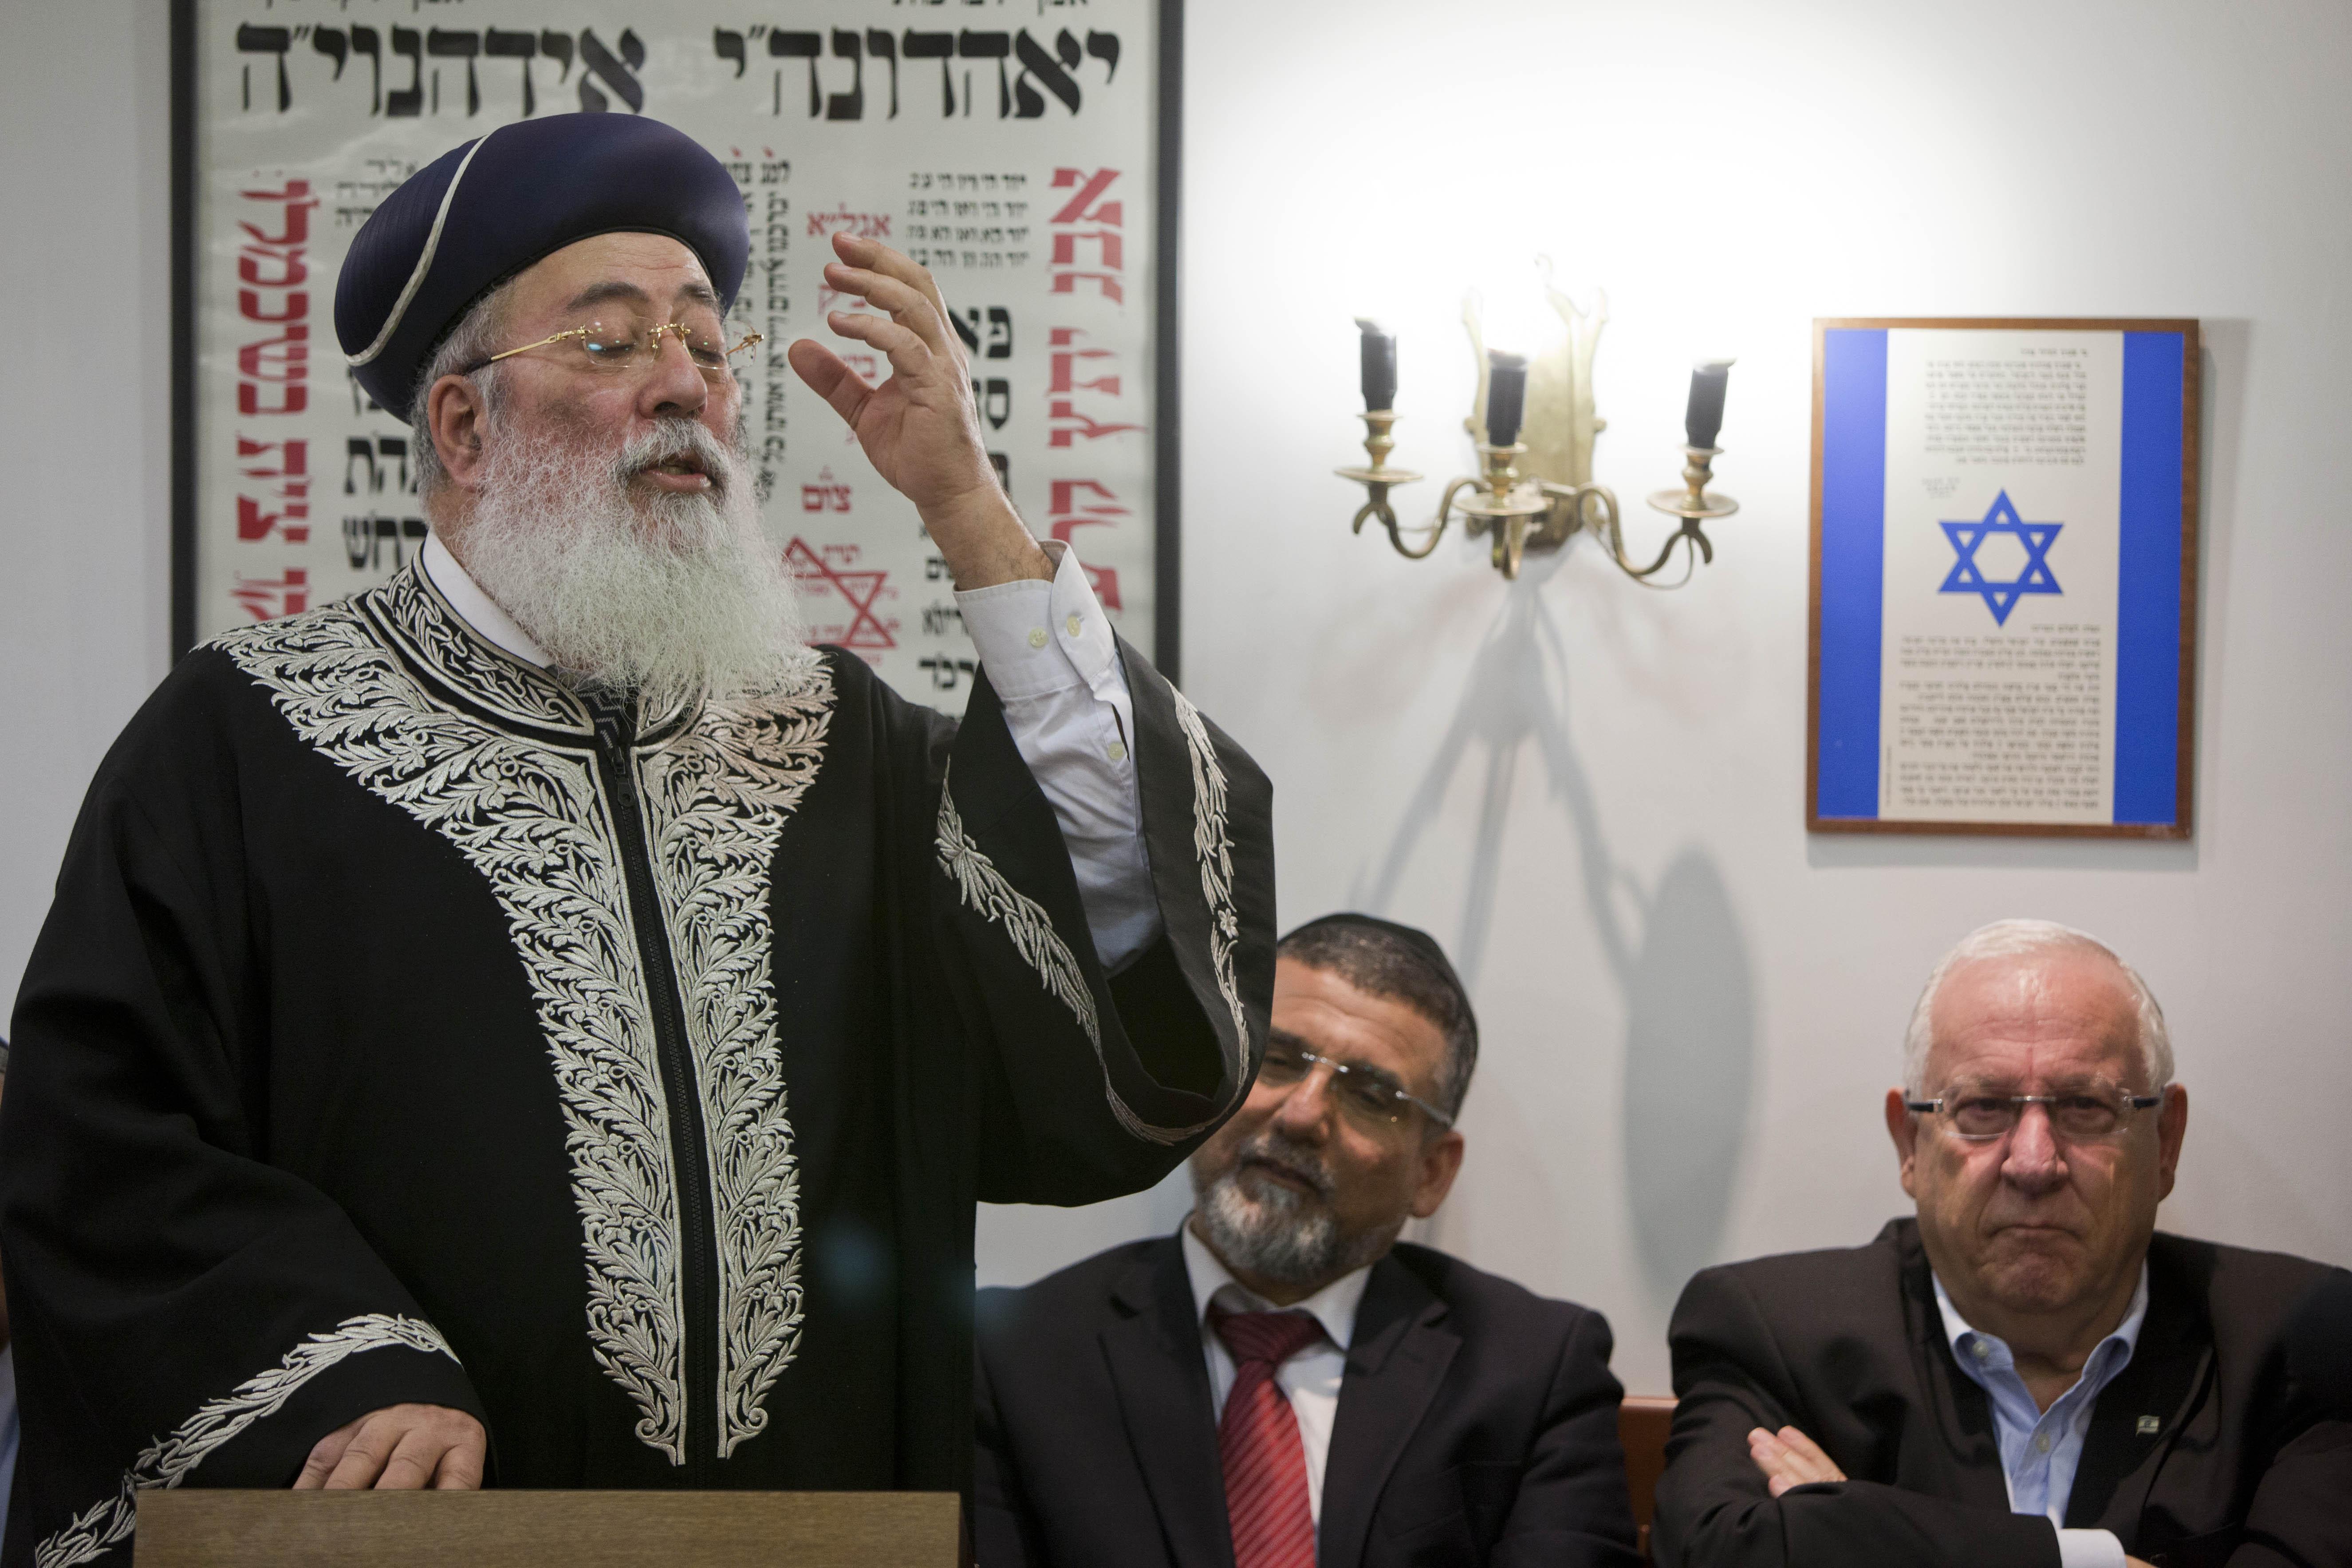 reform judaism Reform judaism in israel: the anatomy of weakness asher cohen, bernard susser modern judaism, volume 30, number 1, february 2010, pp 23-45 (article.